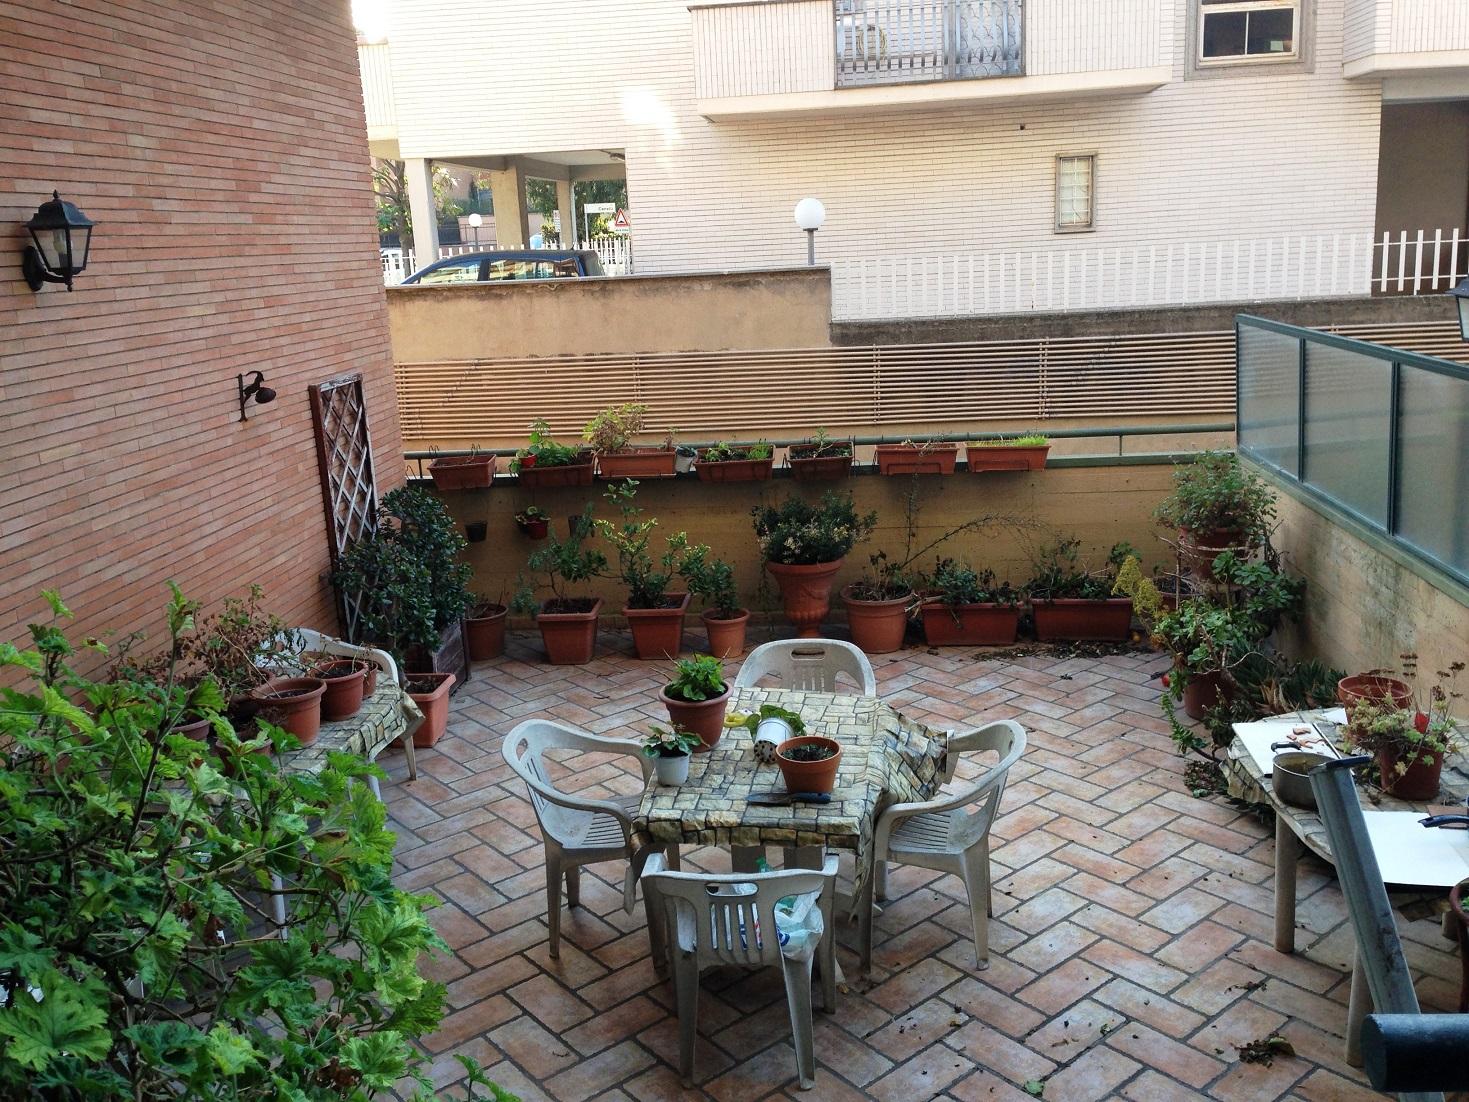 Bilocale vendita roma zona aurelio gregorio vii ubaldi for Arredamento via gregorio vii roma